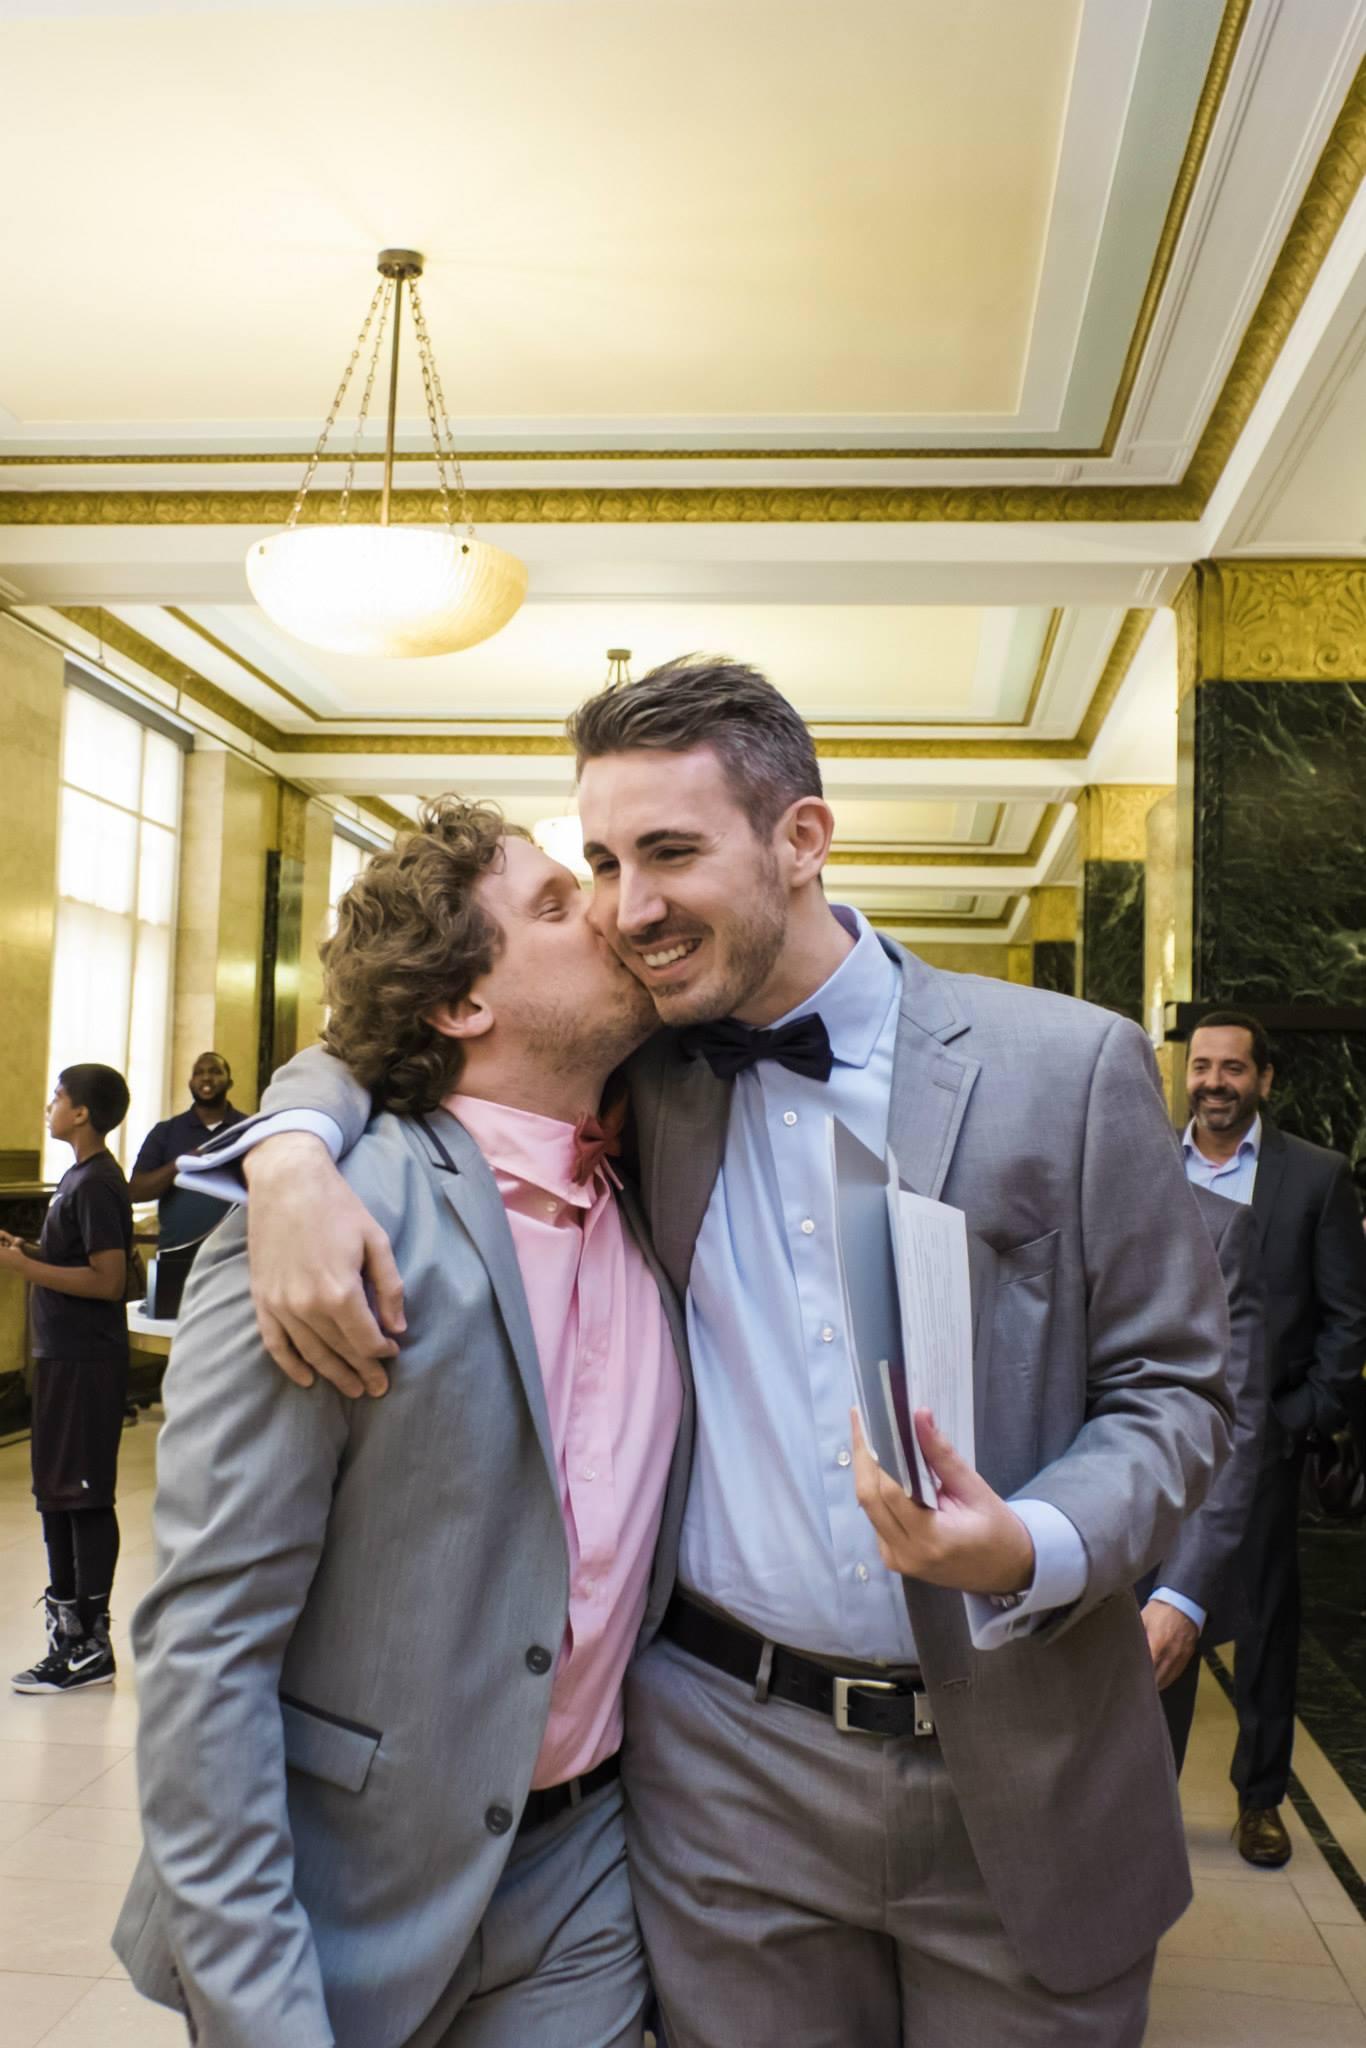 new-york-city-civil-wedding-photo-5.jpg